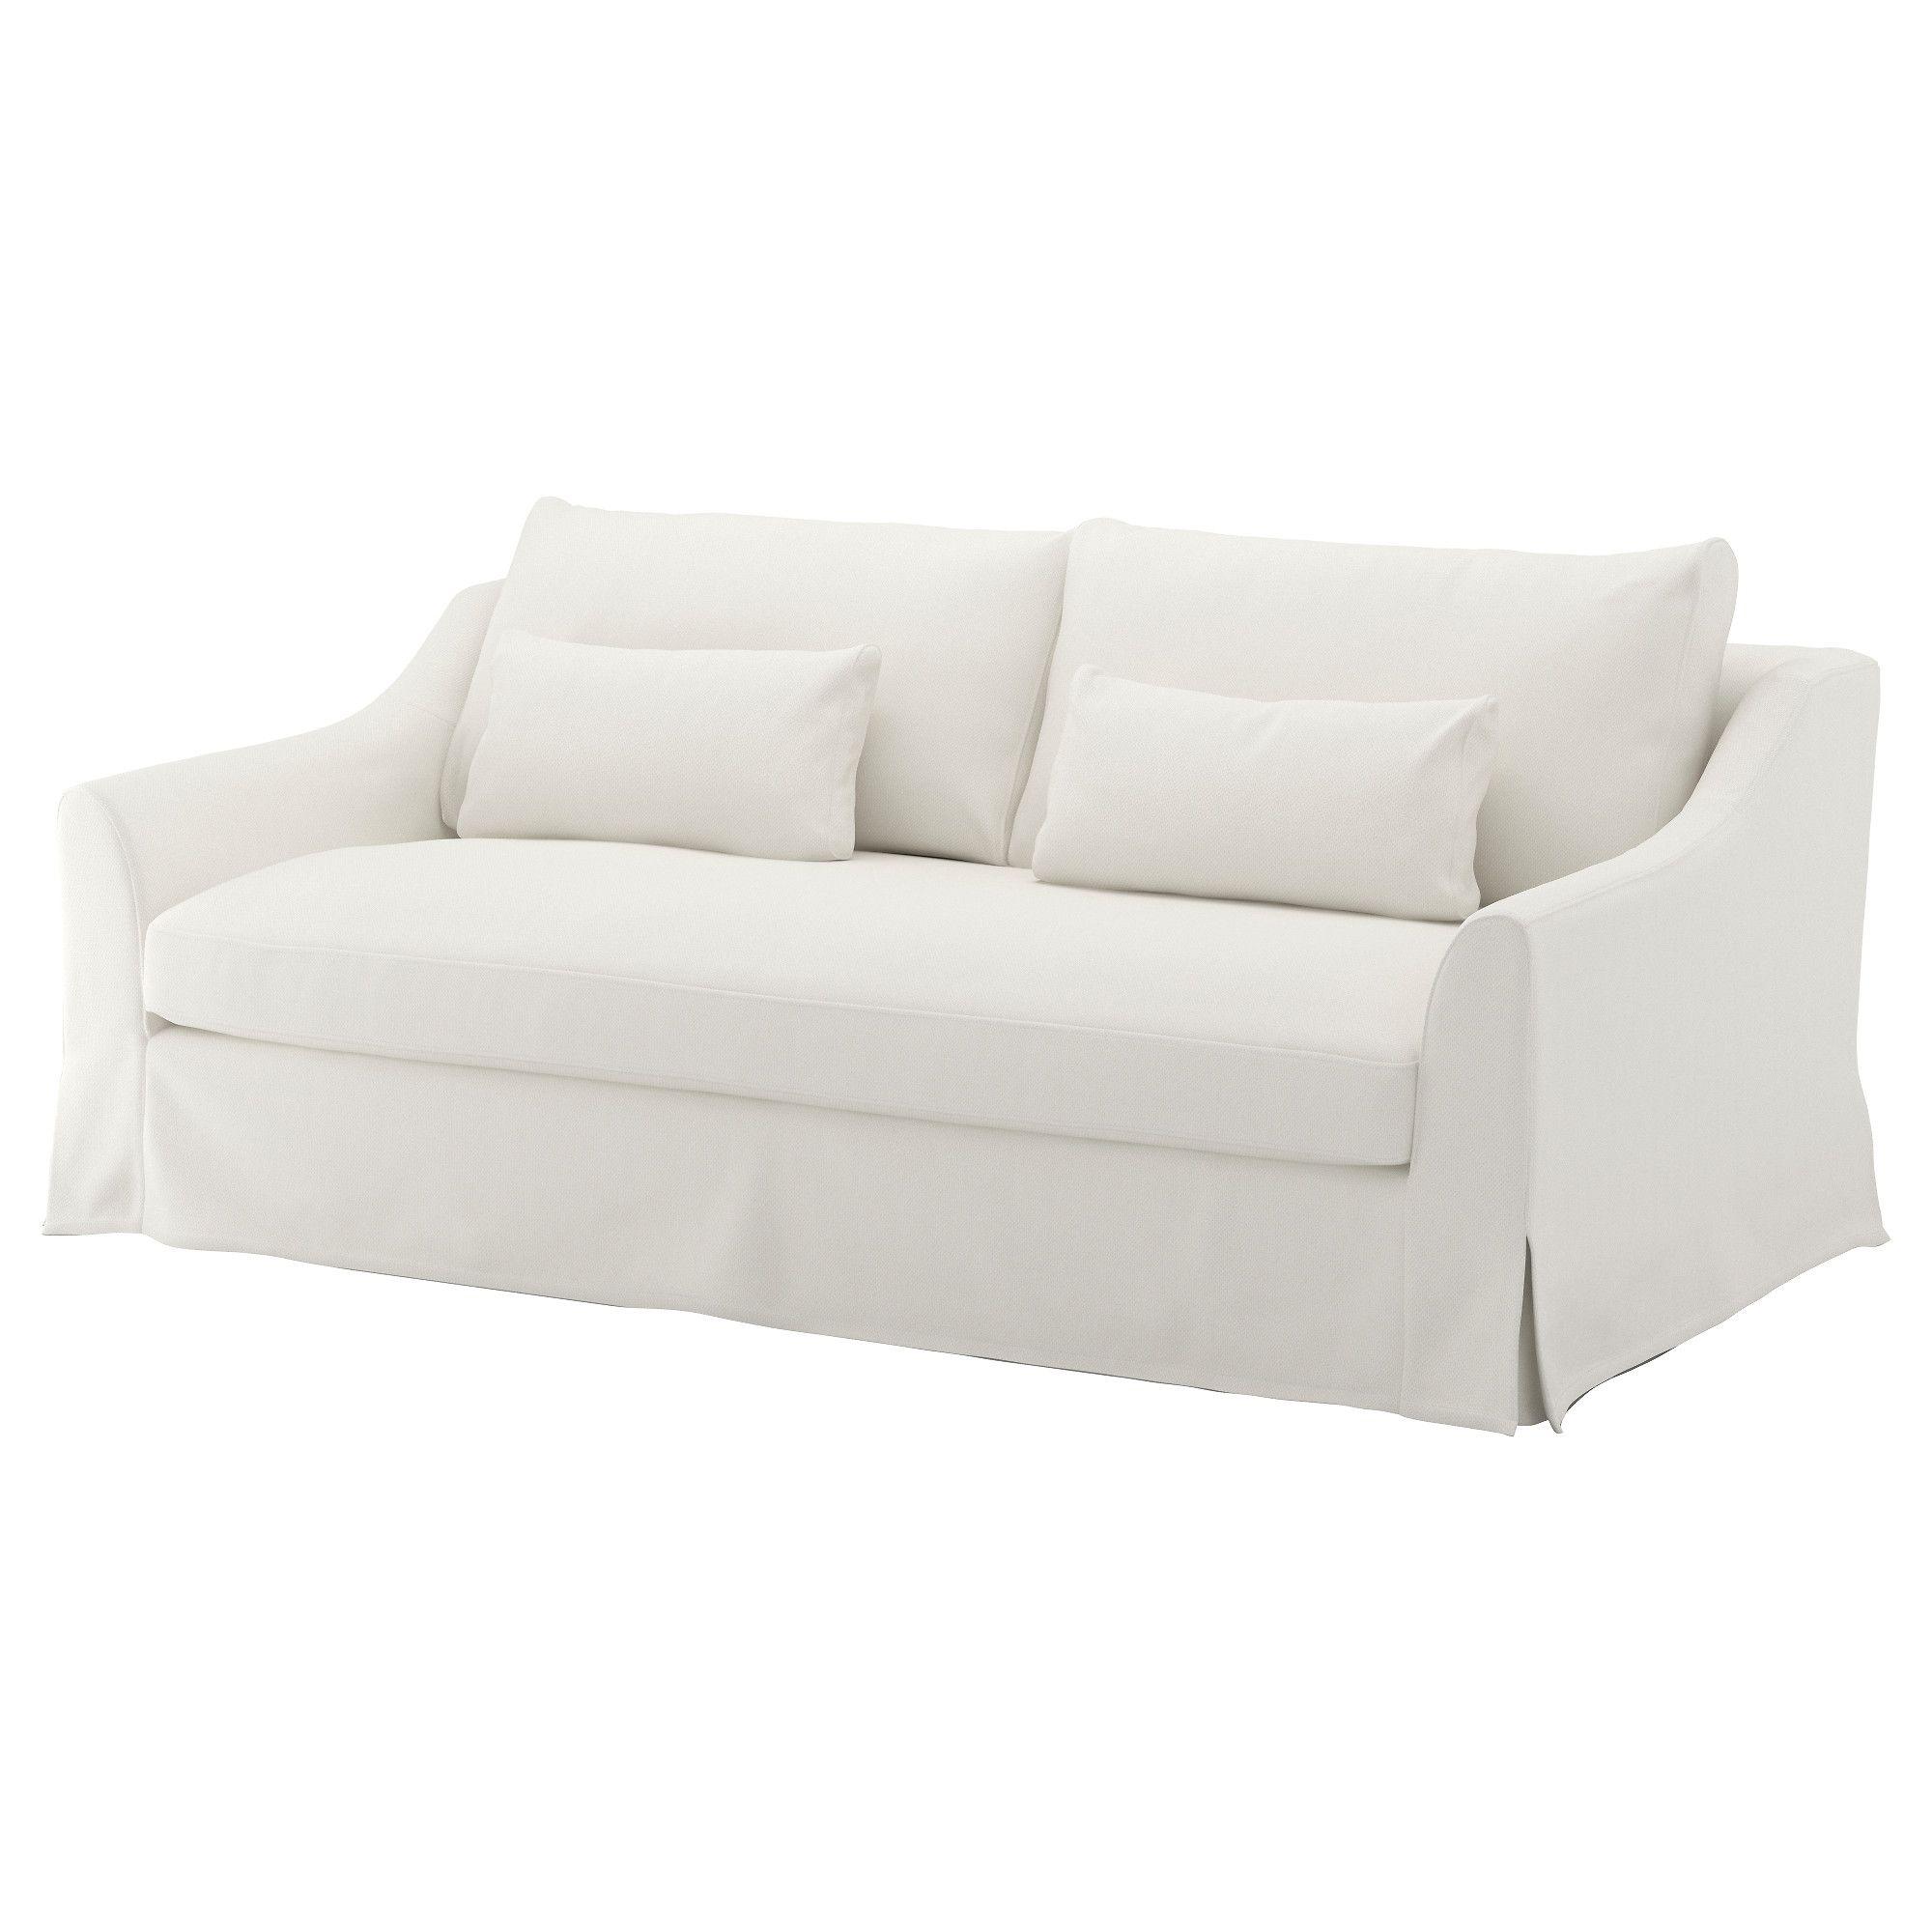 Perfect FÄRLÖV 3 Seat Sofa Flodafors White